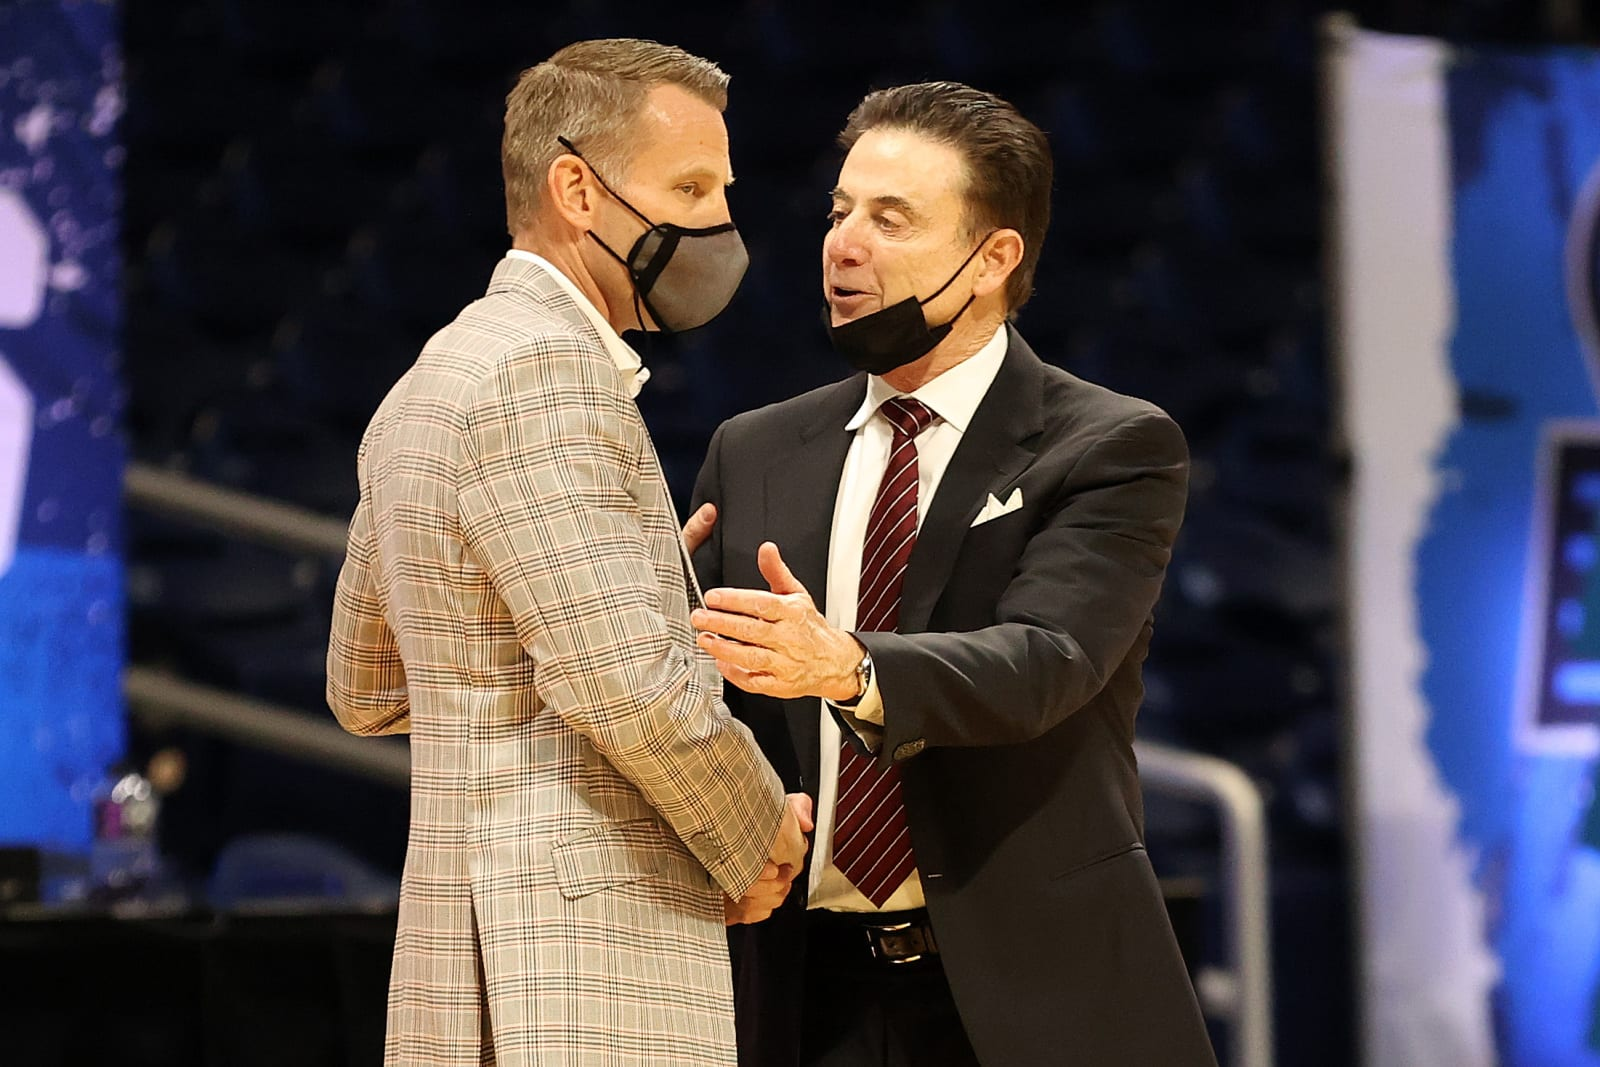 Rick Pitino, Texas Basketball